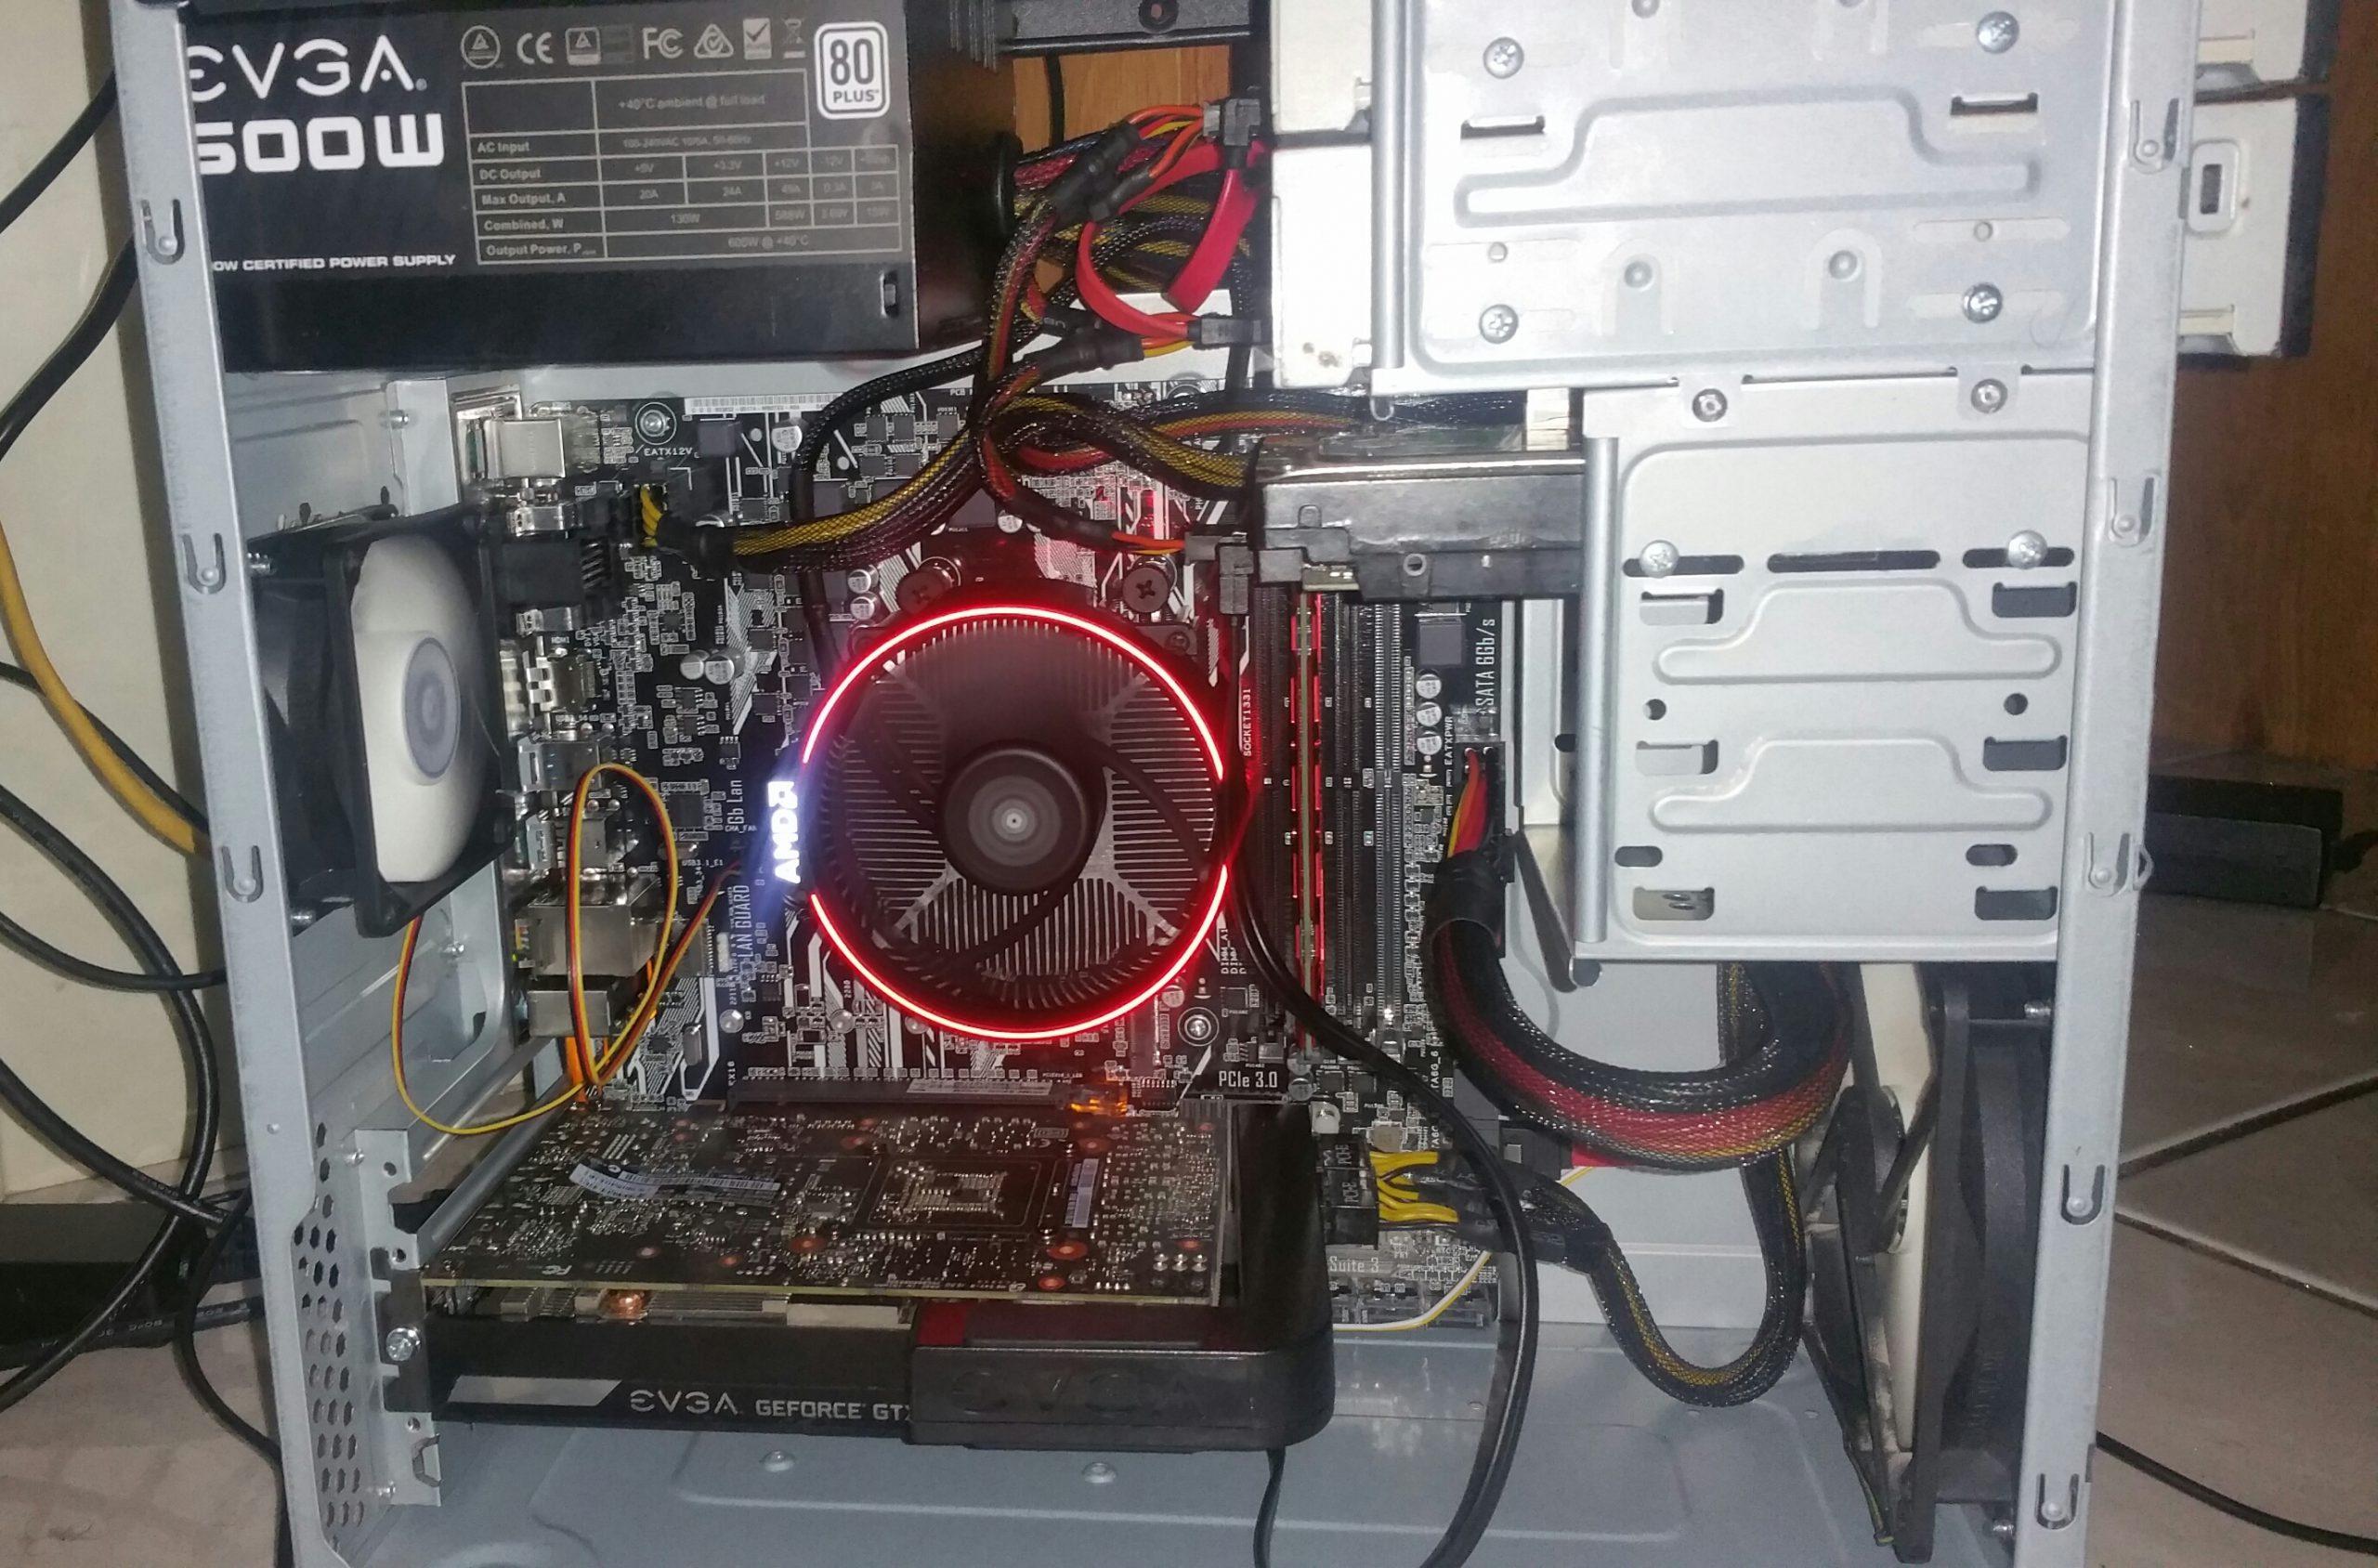 AMD Ryzen 7 1700 Build 2